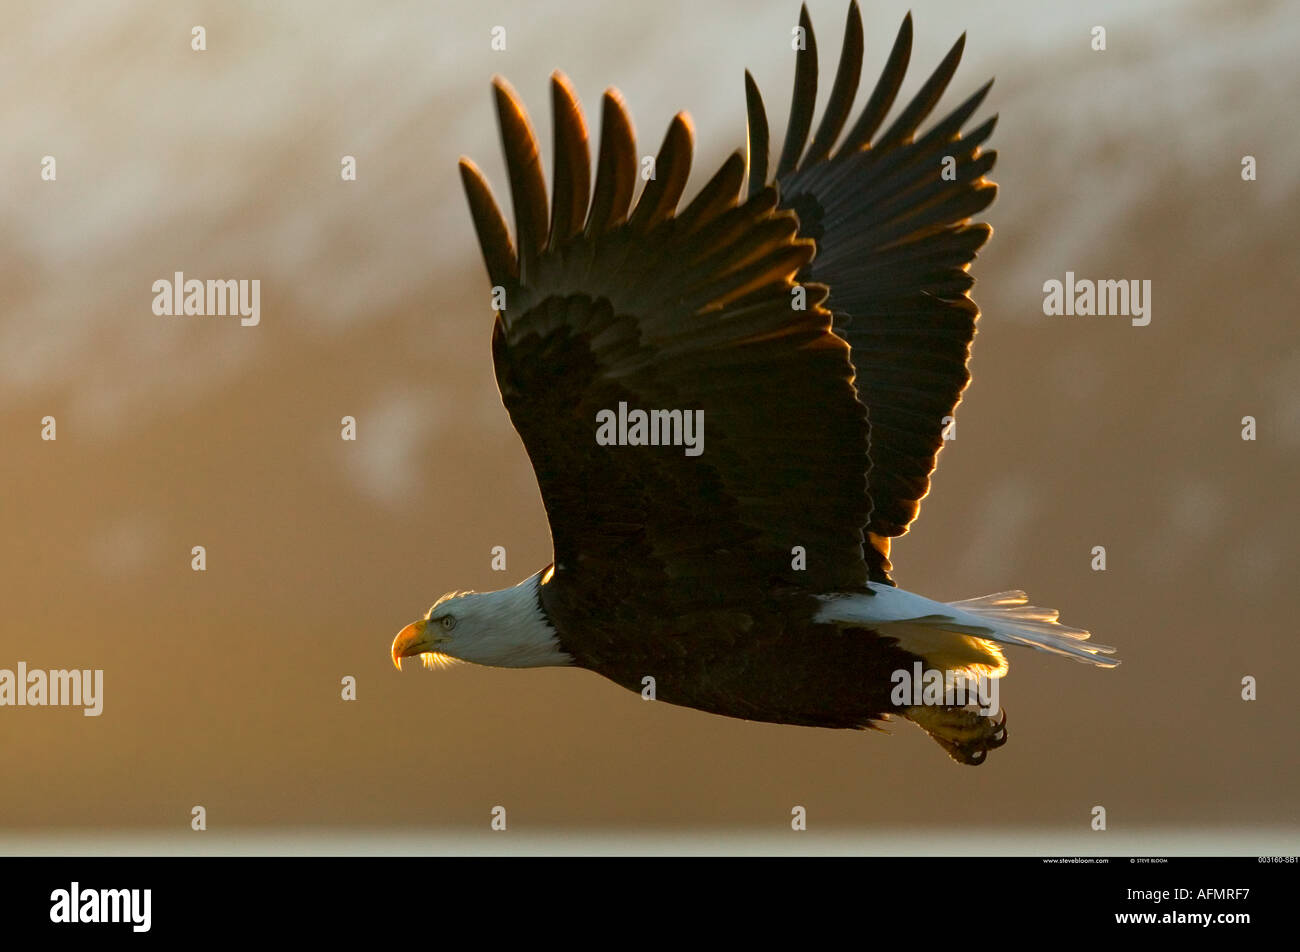 Bald eagle in flight Alaska - Stock Image